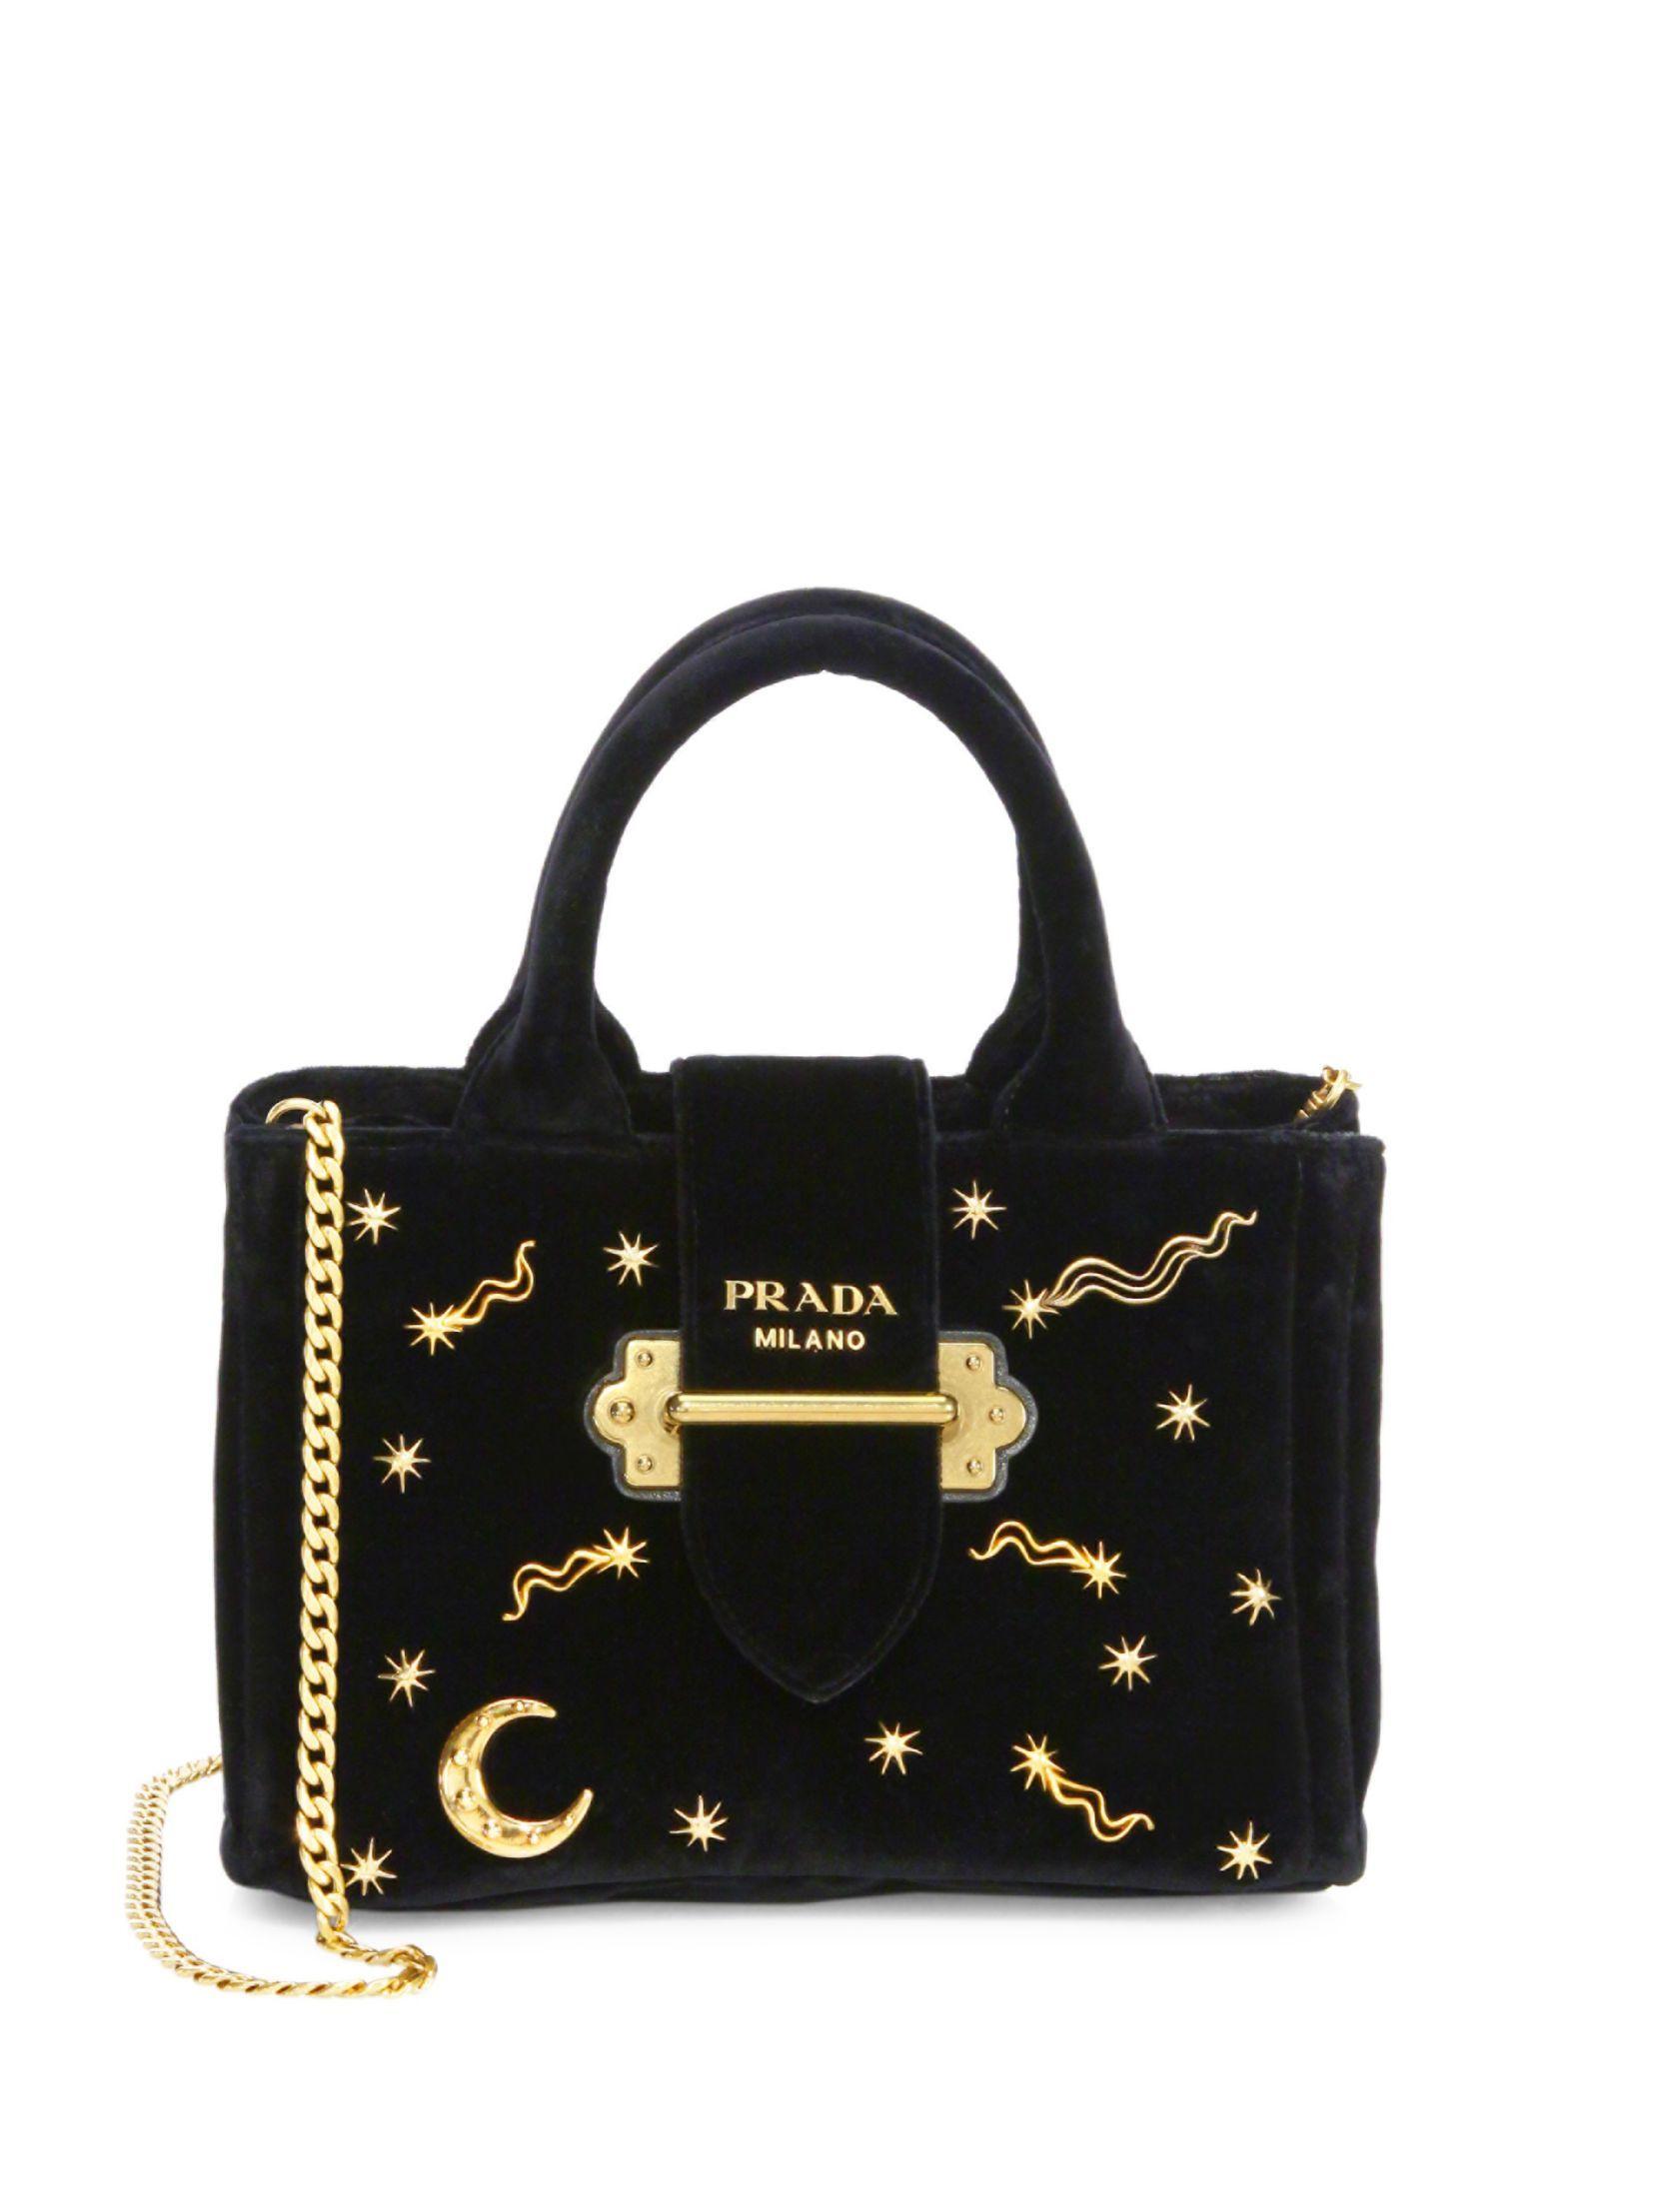 Prada Giardiniera Studded Velvet Chain Handbag